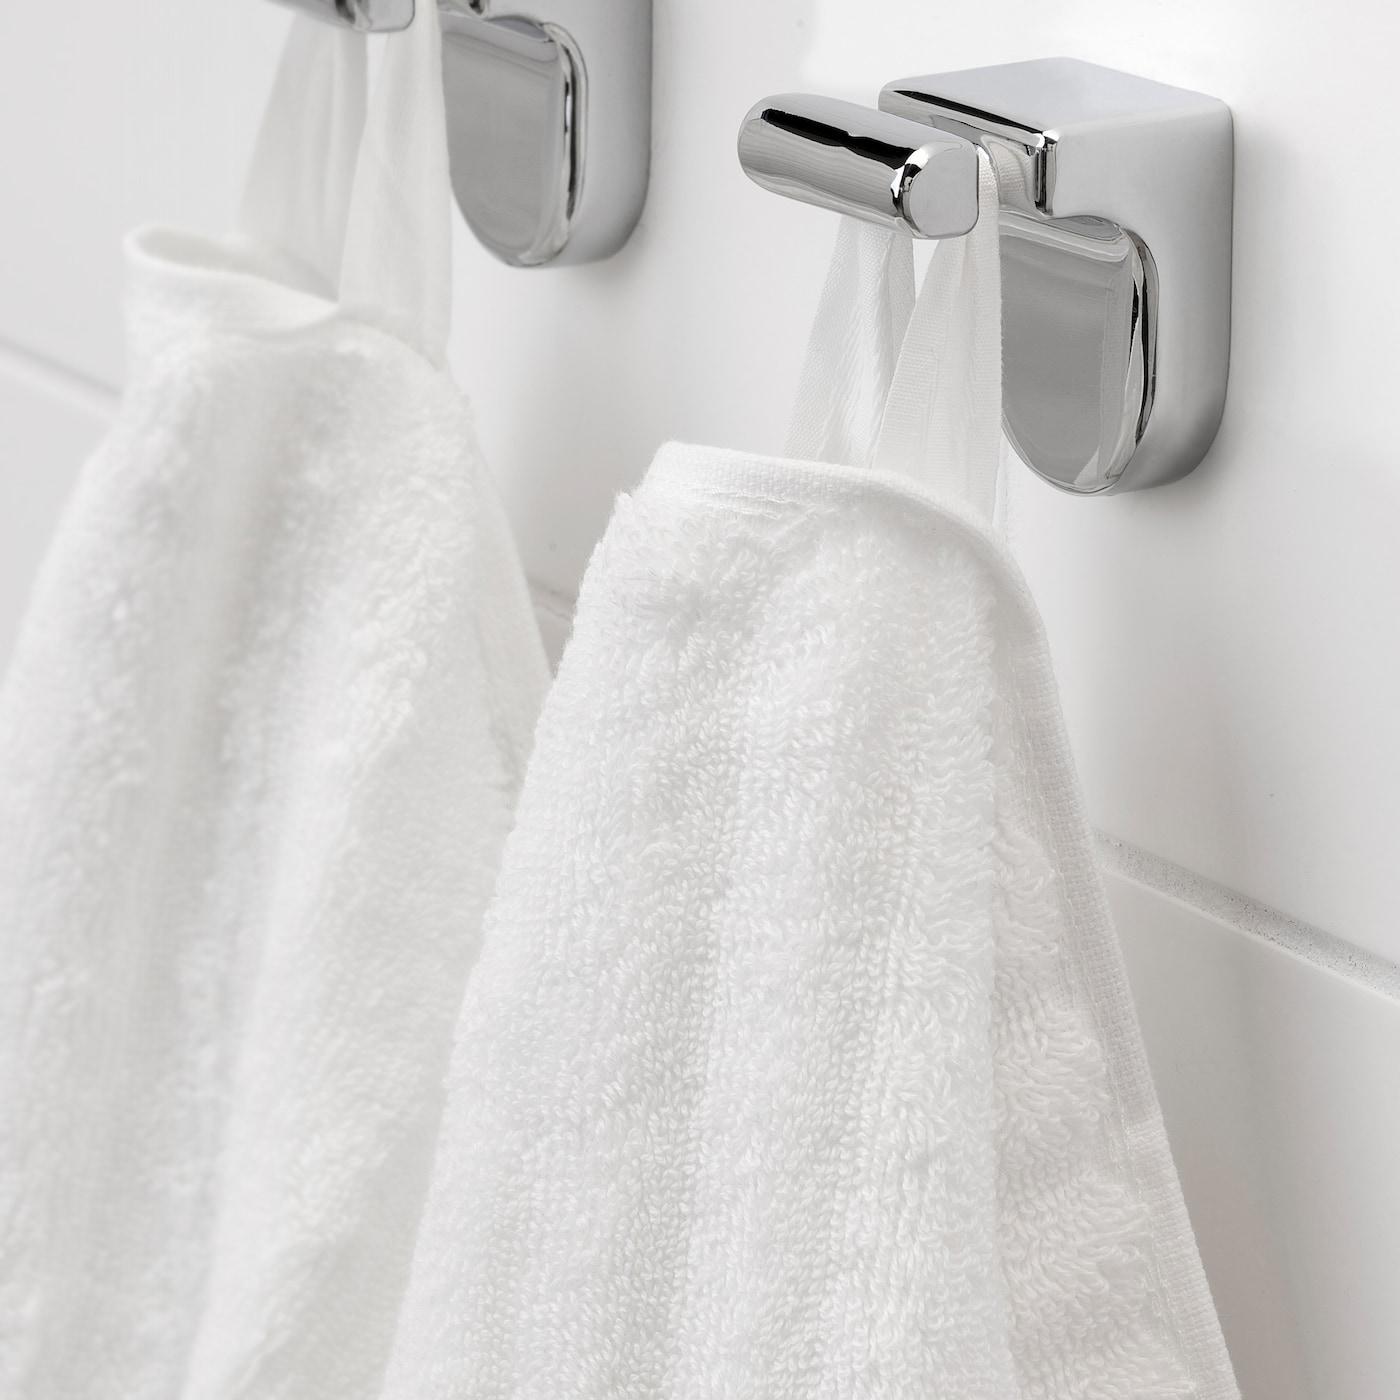 Flodalen Drap De Bain Blanc 70x140 Cm Ikea